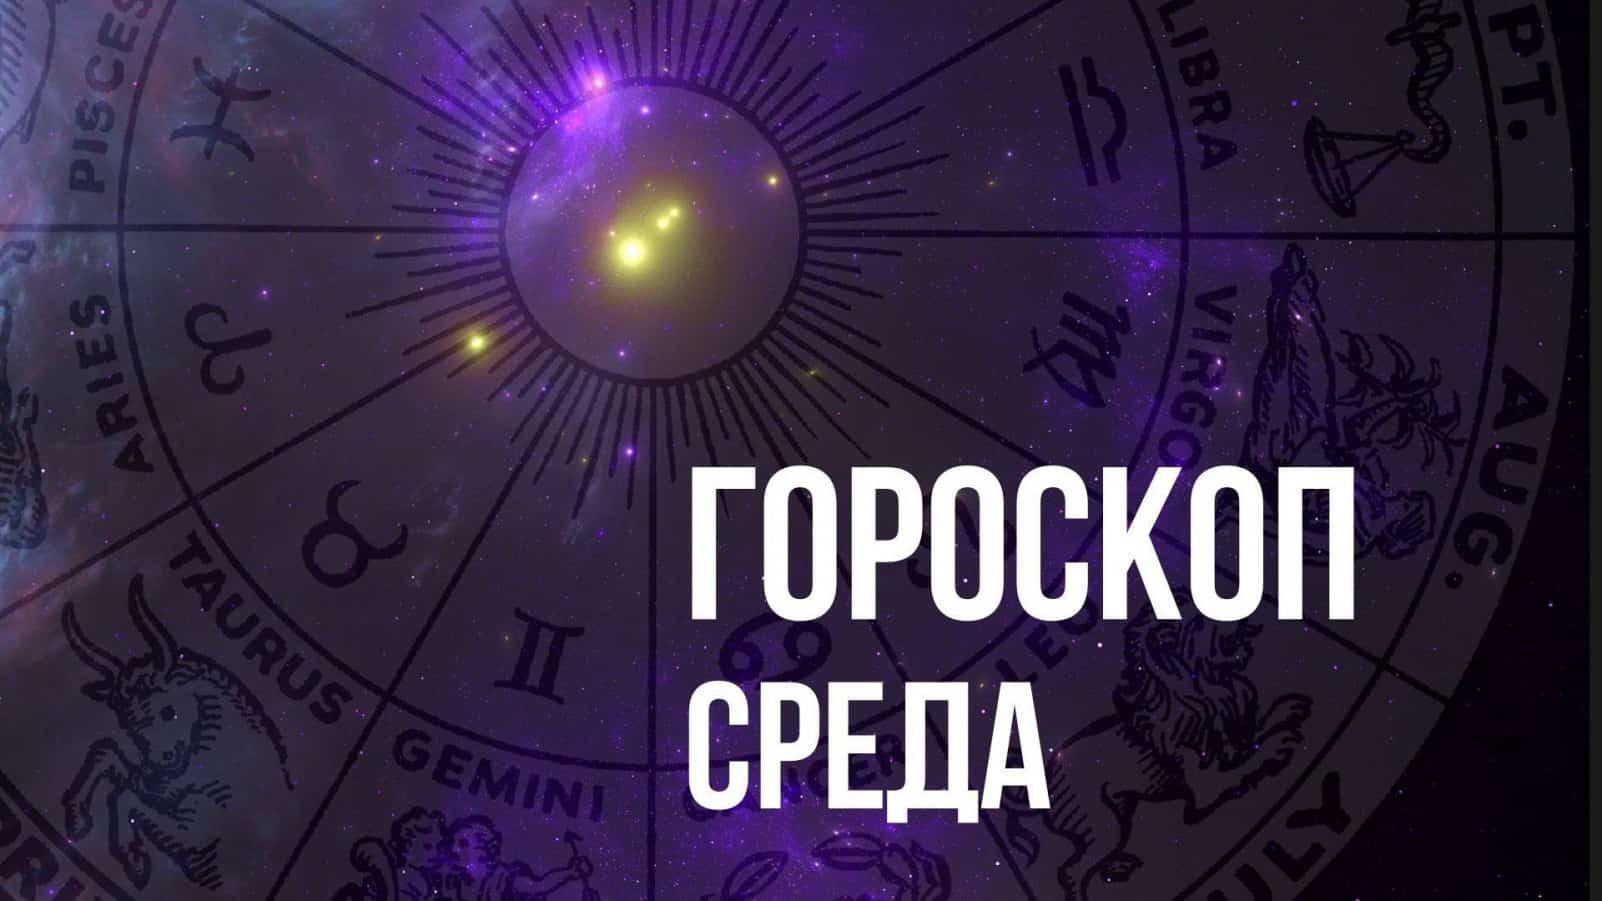 Гороскоп на среду 16 июня для каждого знака Зодиака